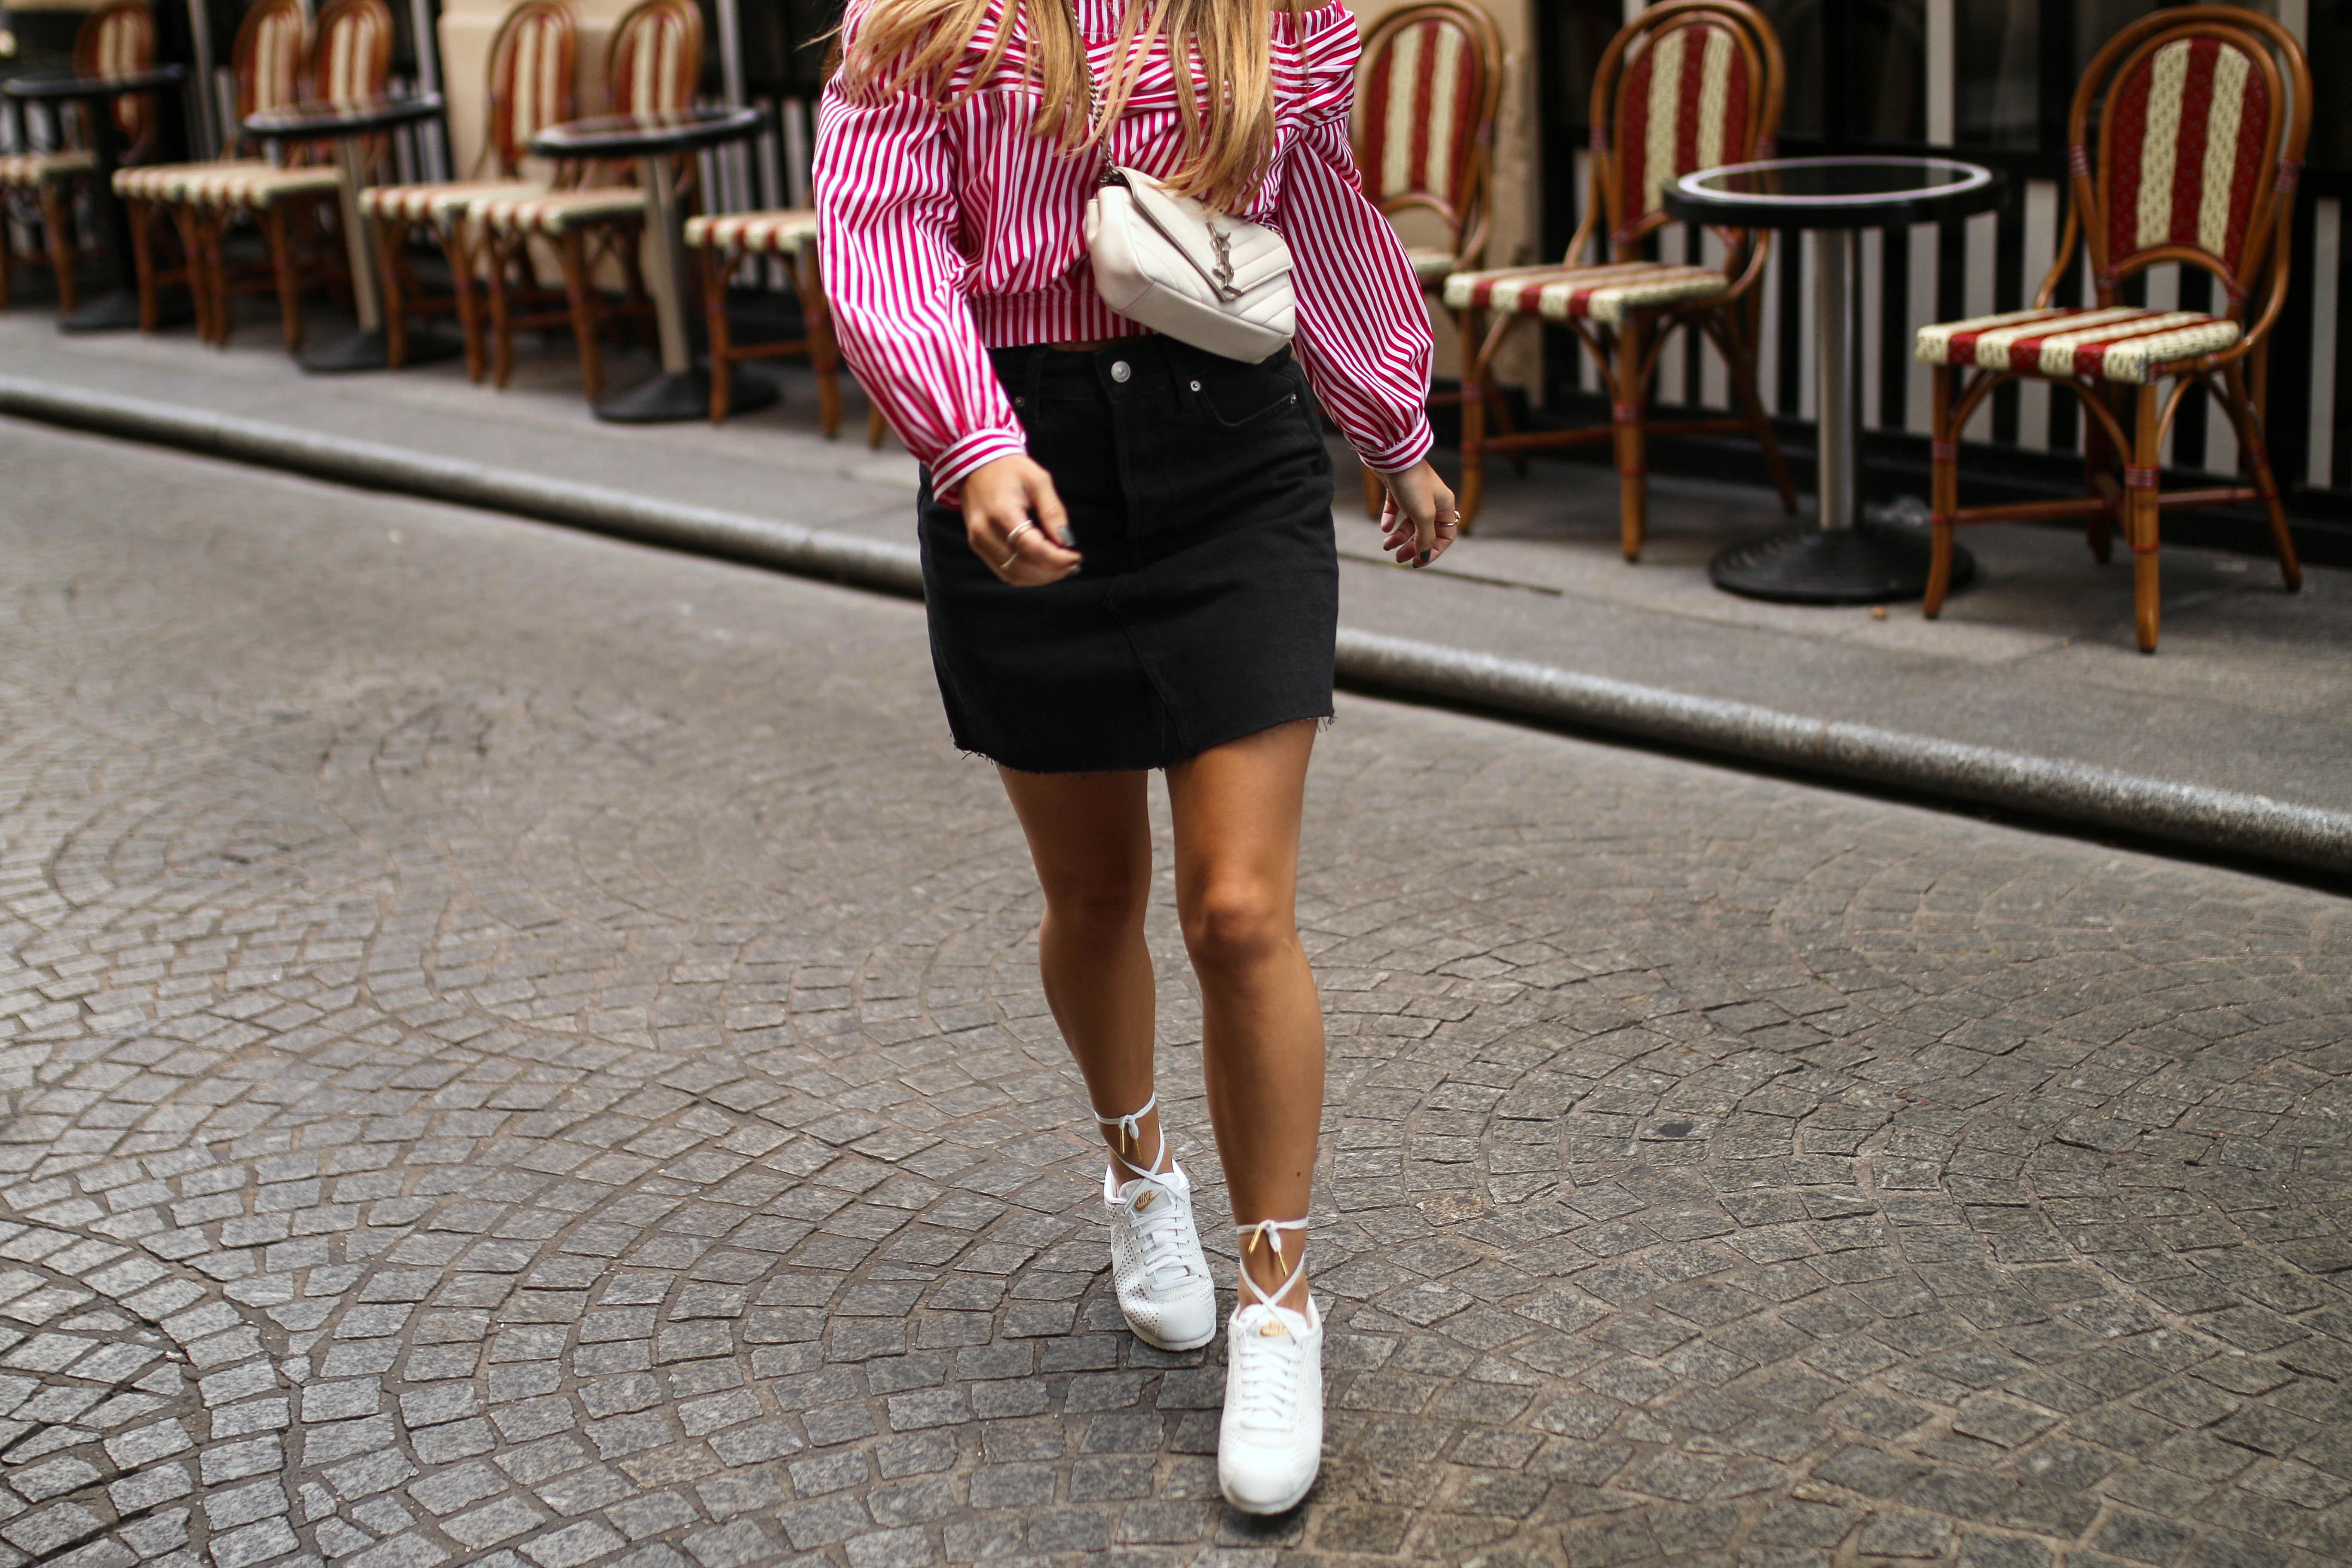 nike cortez sneaker inspiration pinterest tumblr fashion blog streetstyle